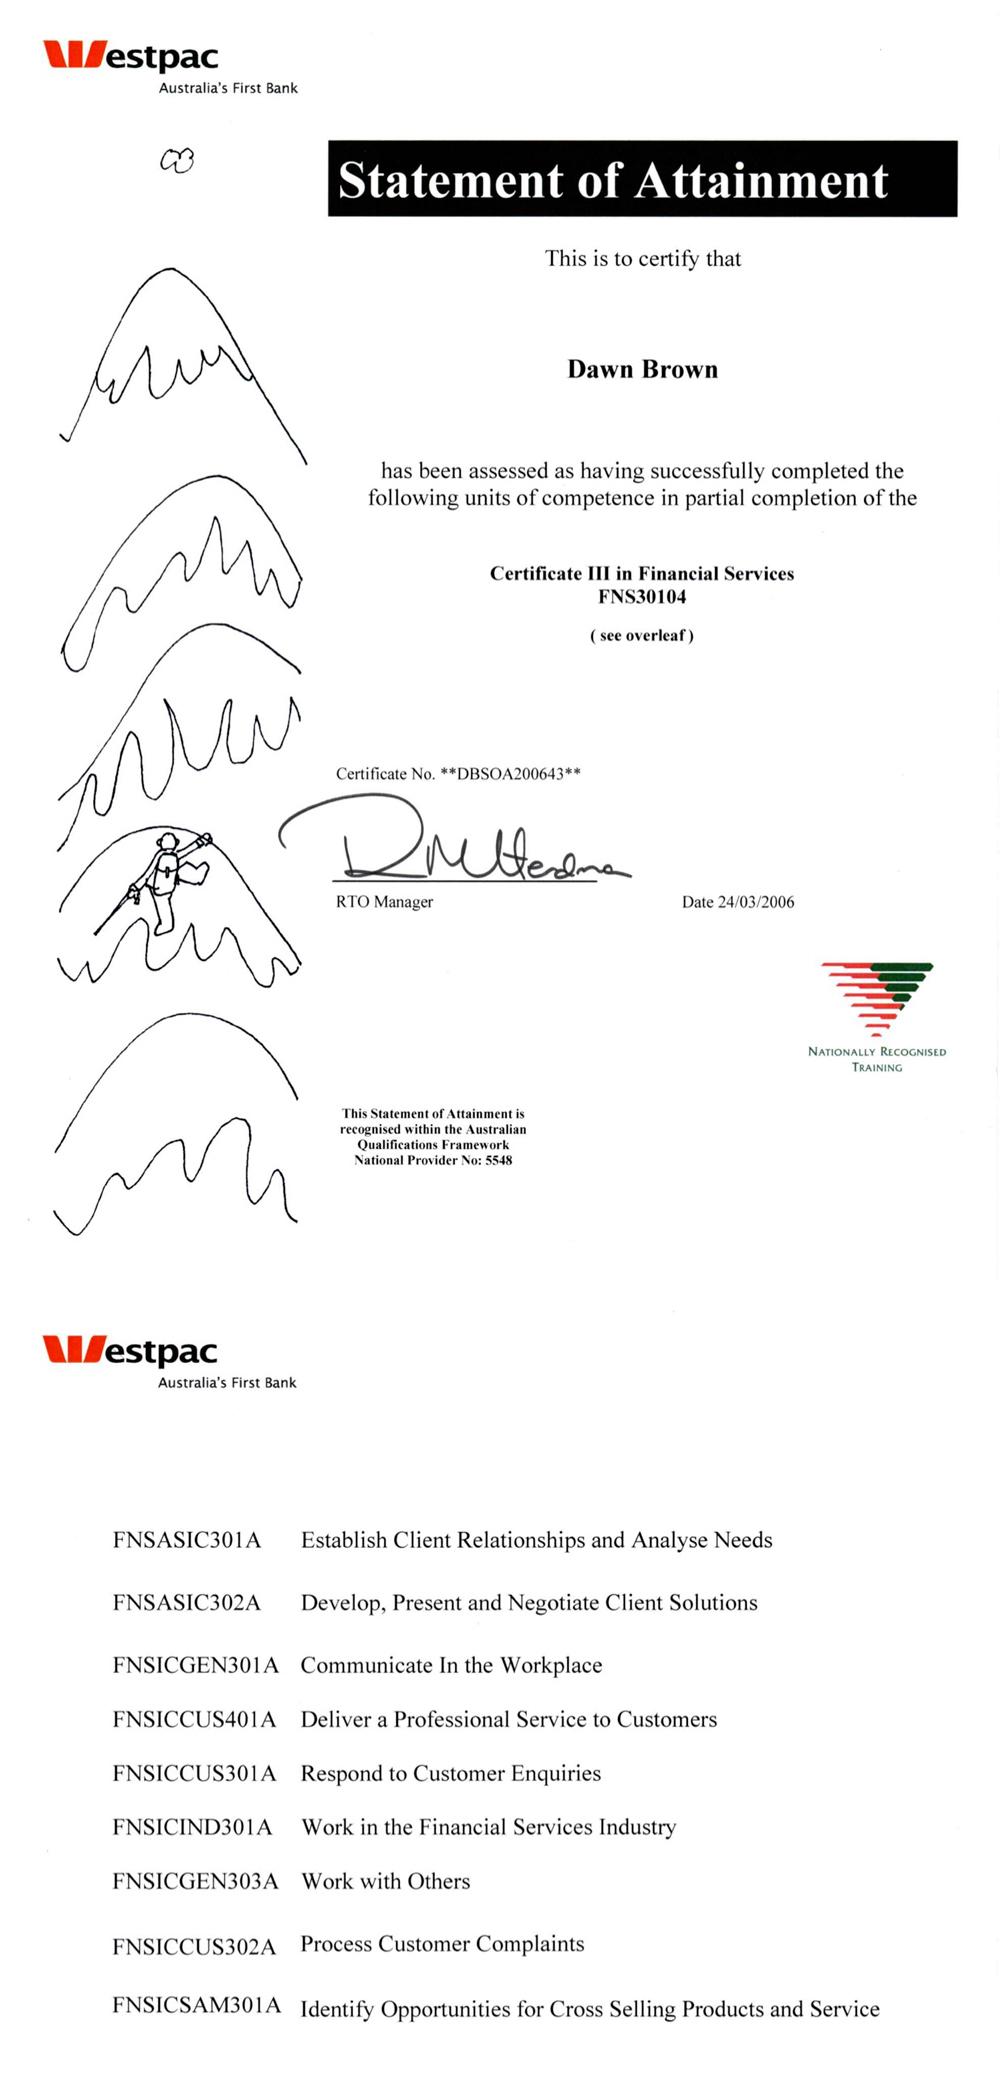 Westpac Certificate three in financial